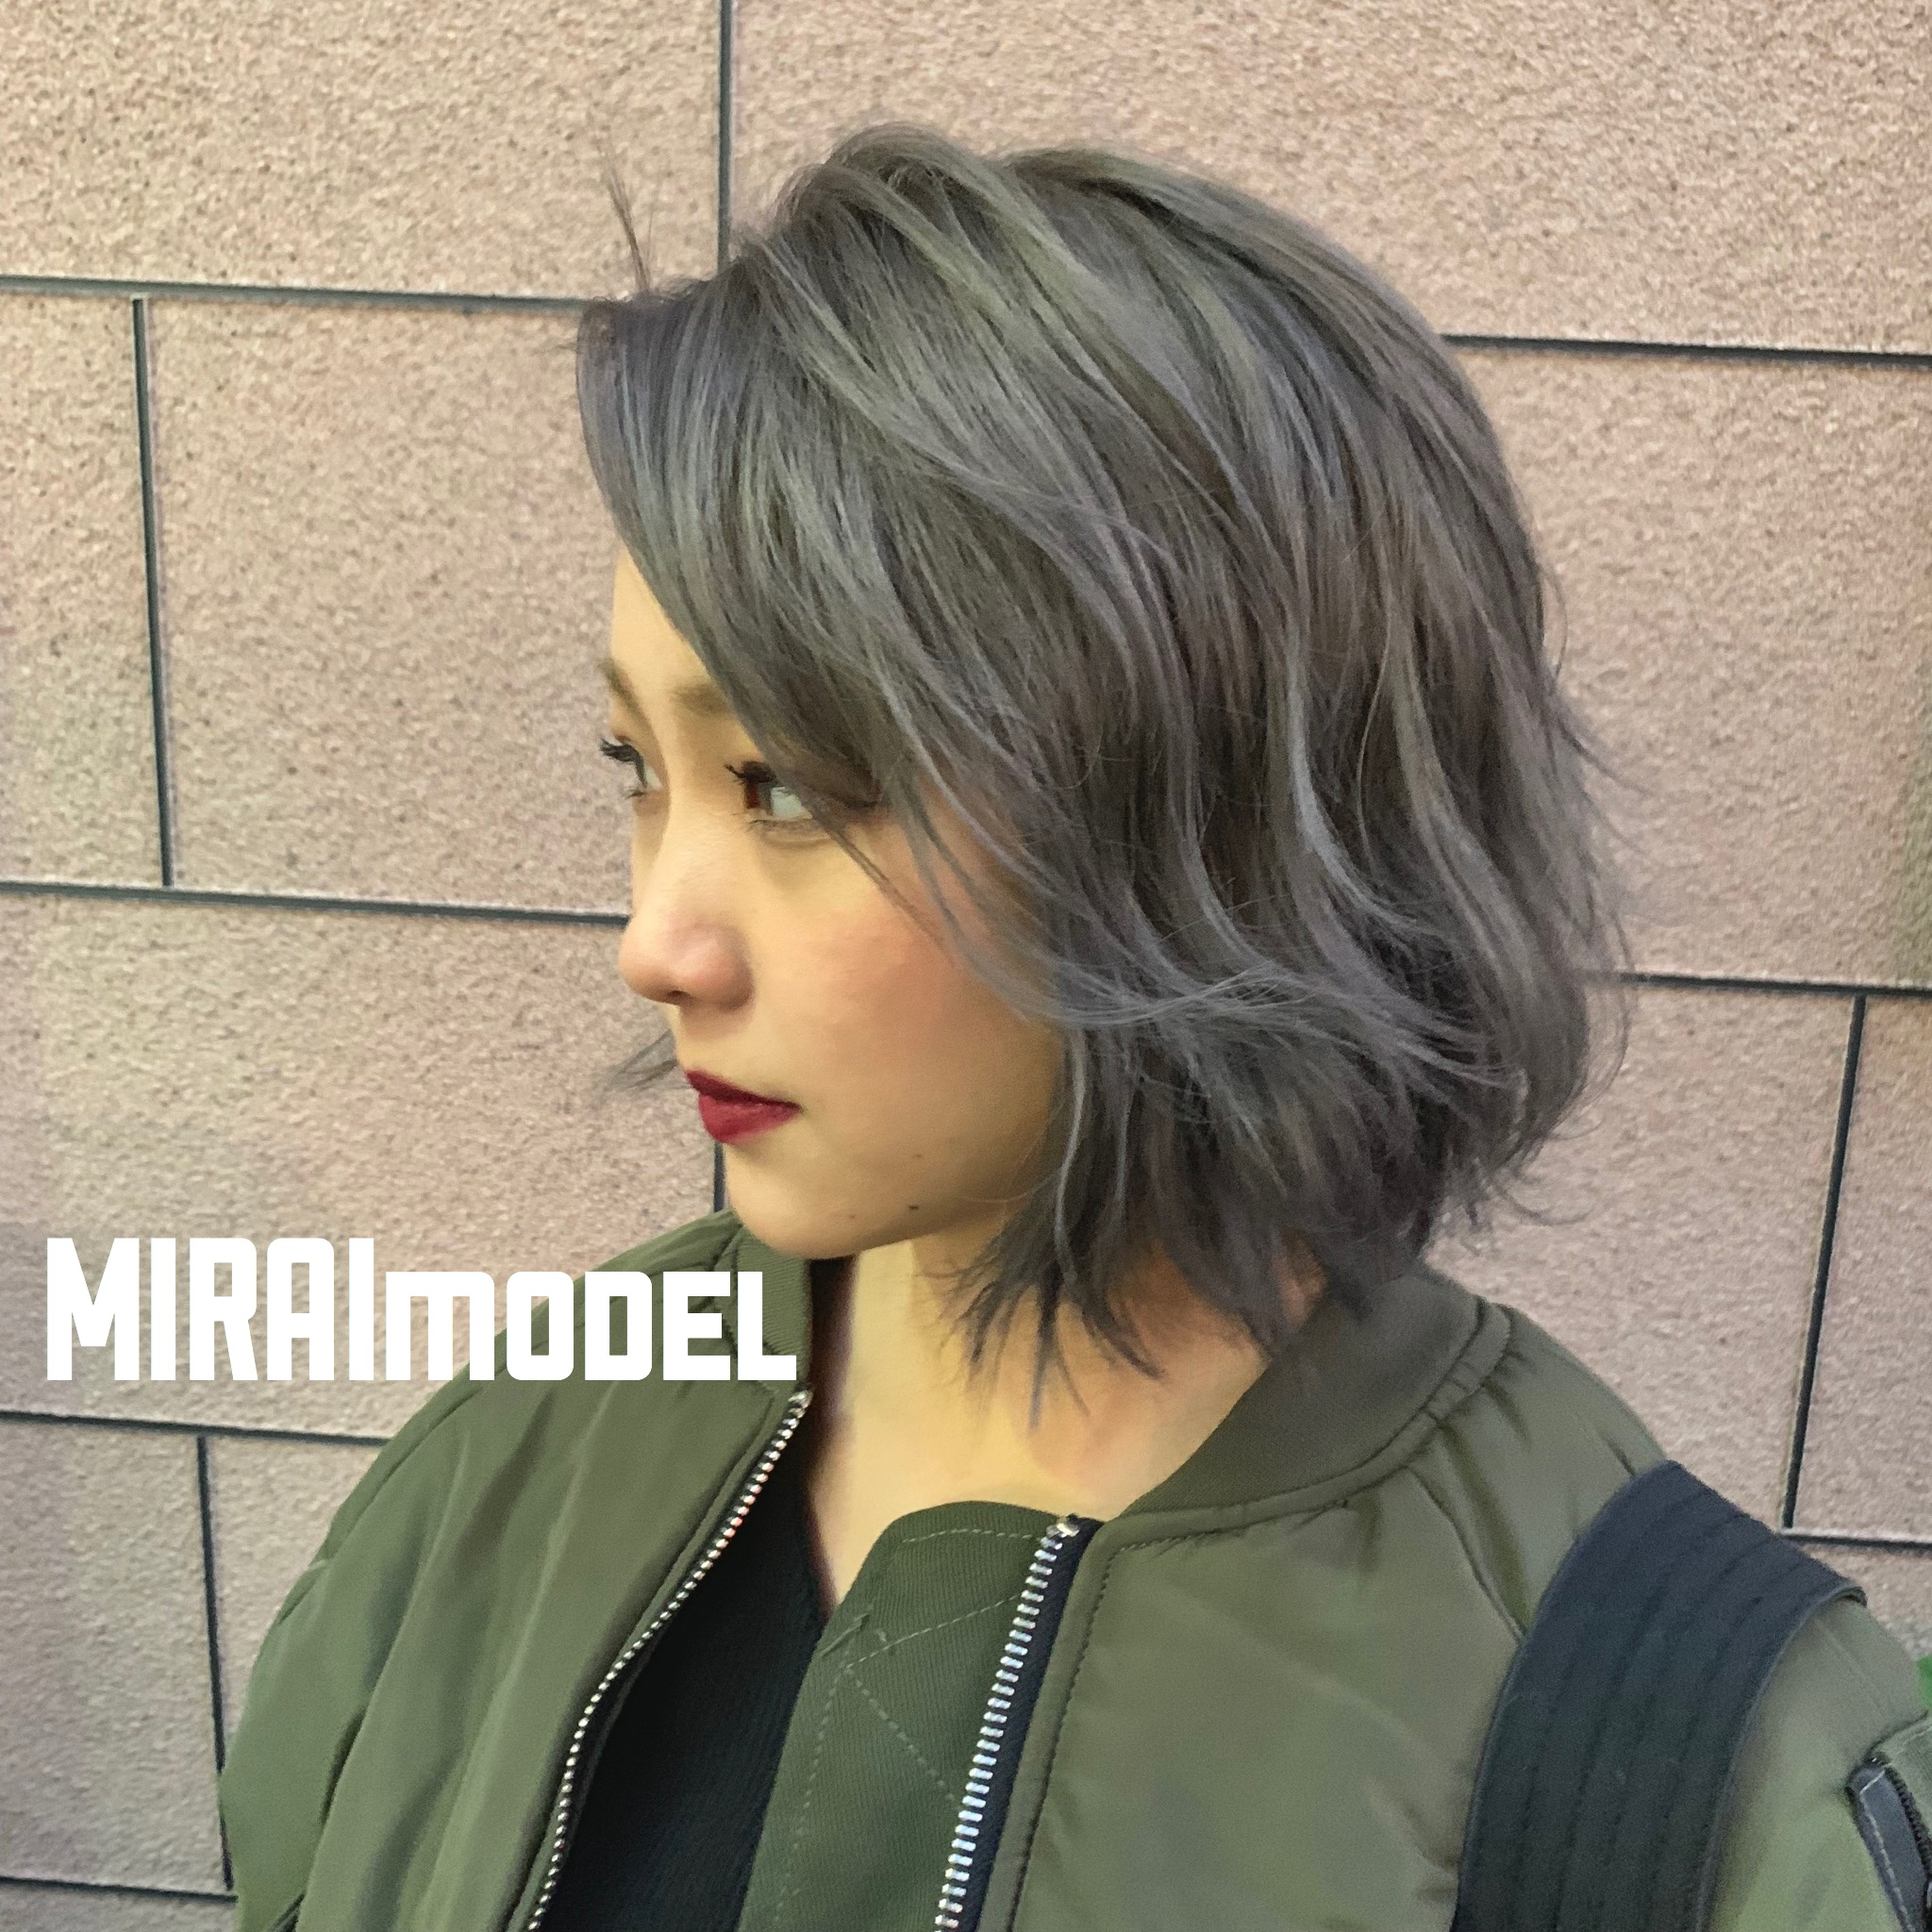 MIRAImodel?⛓